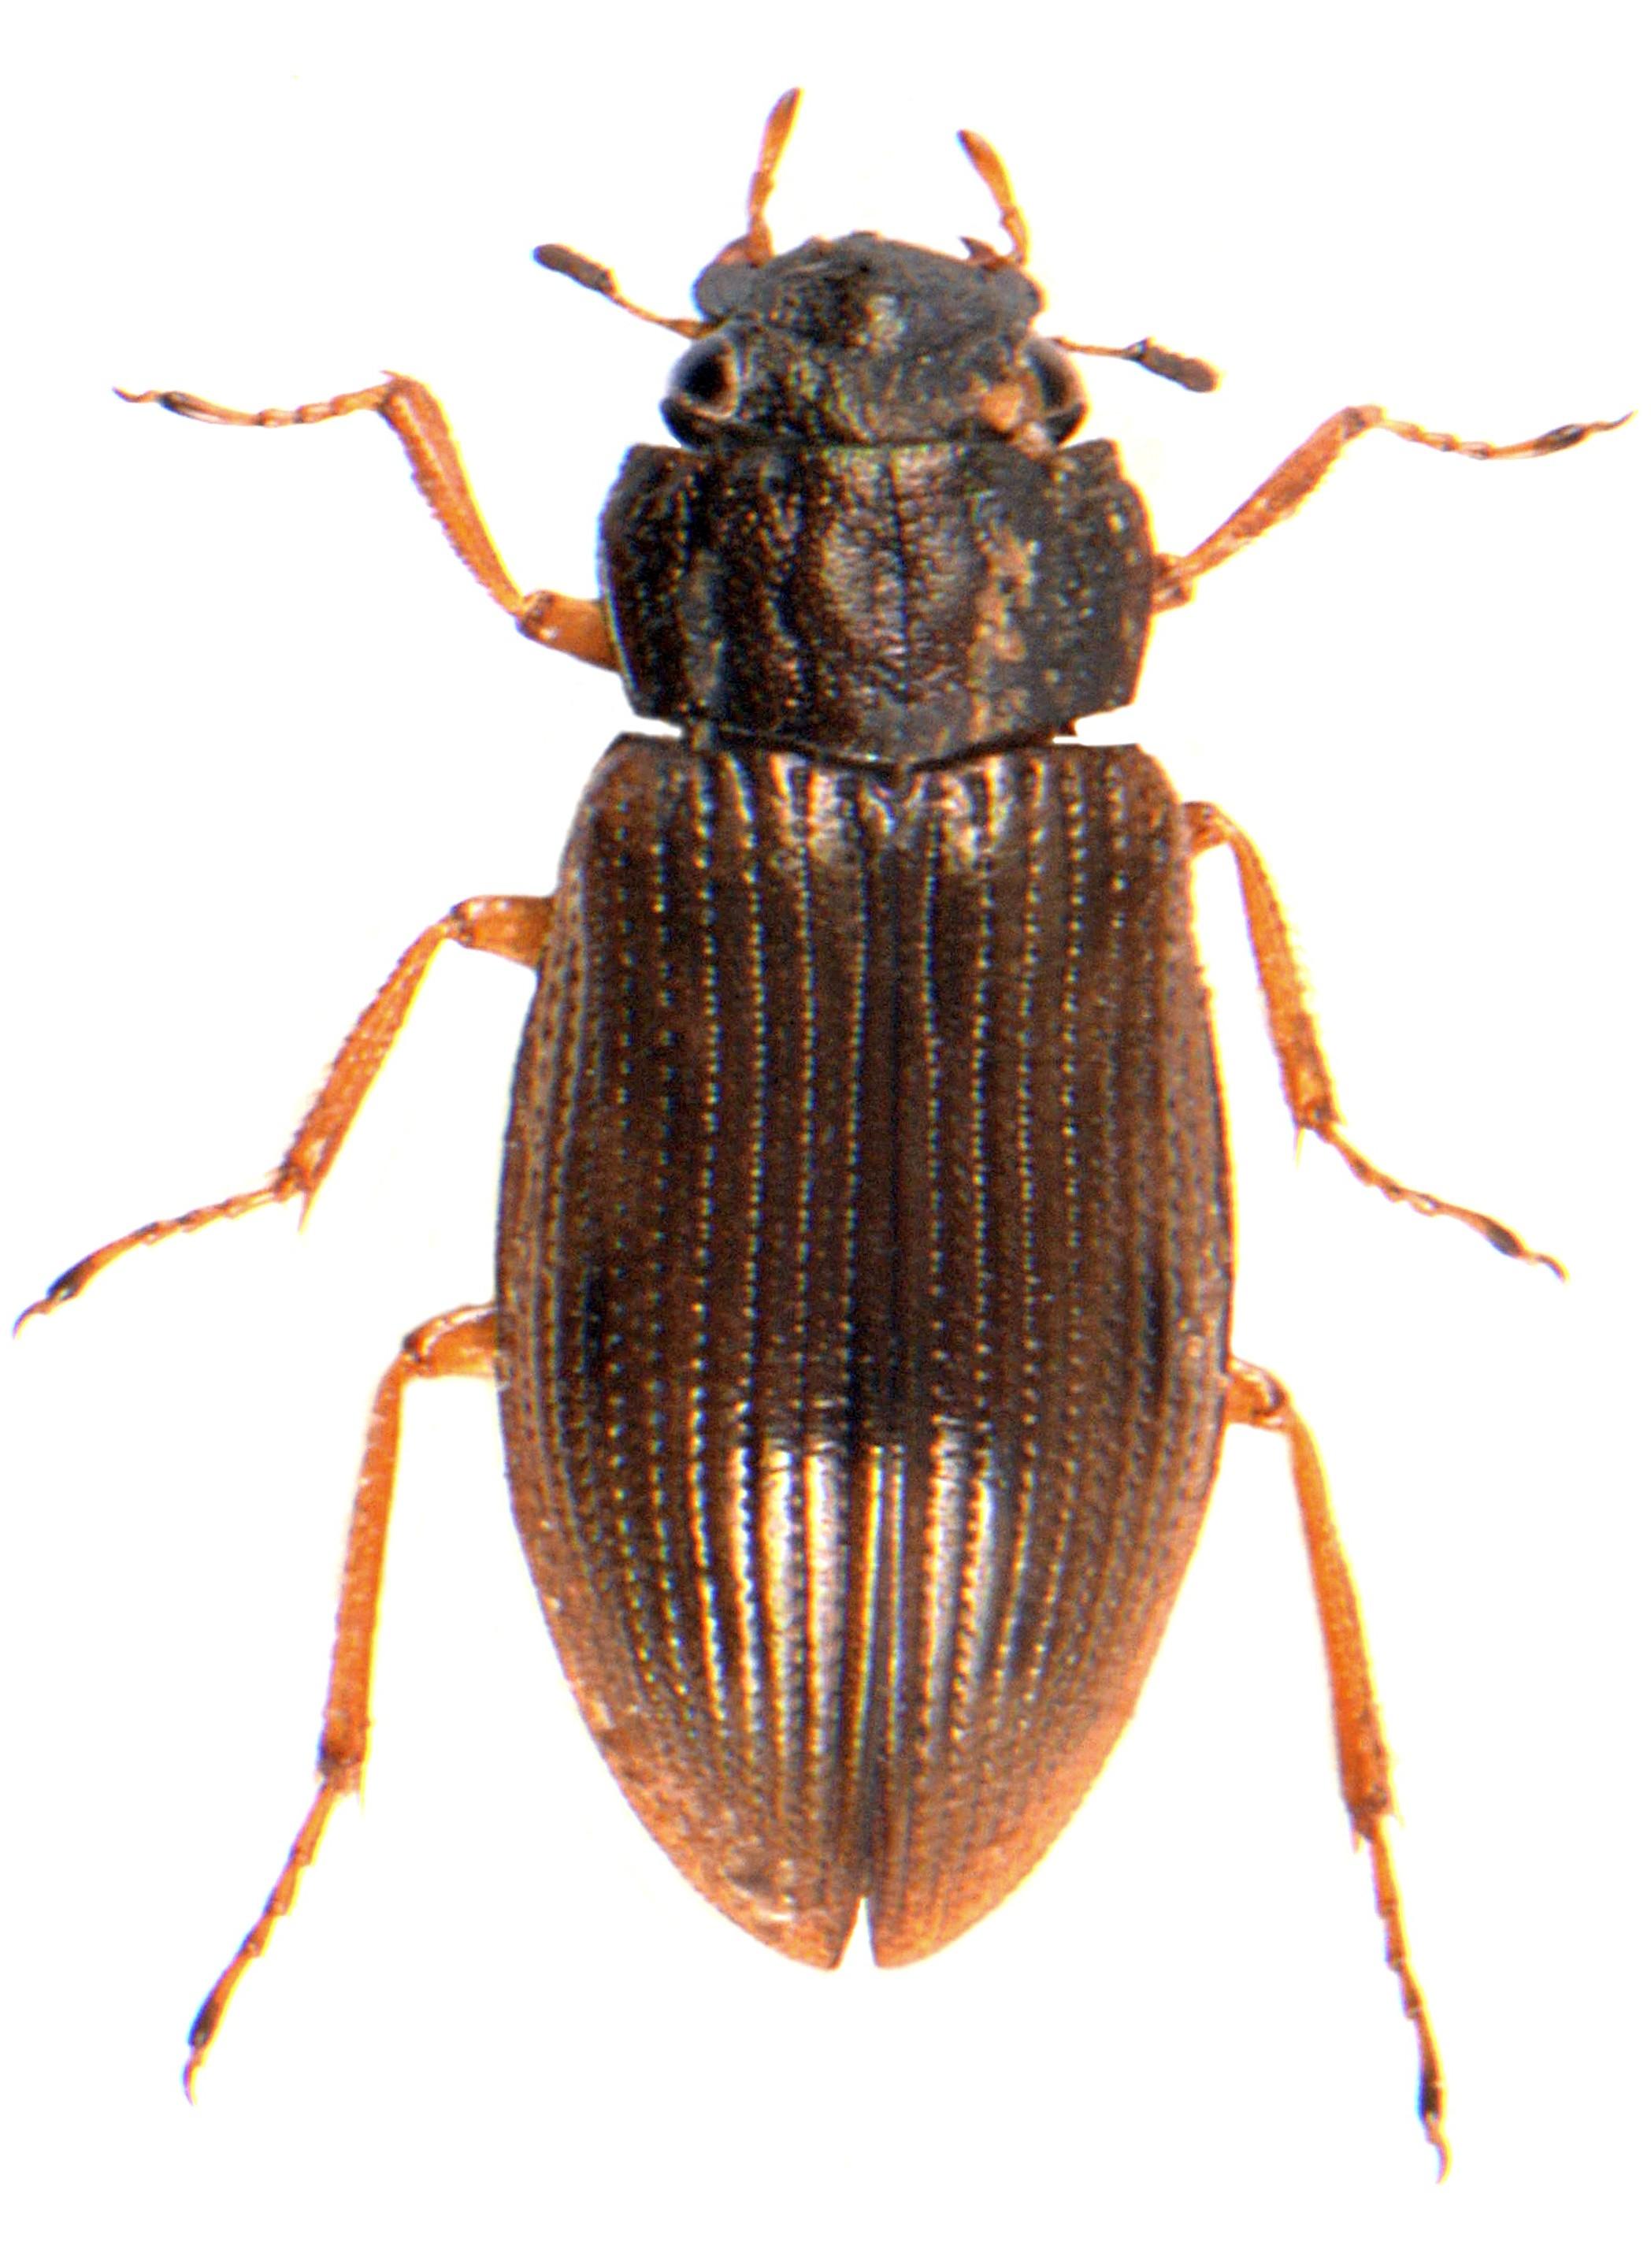 H. (Rhopalhelophorus) flavipes